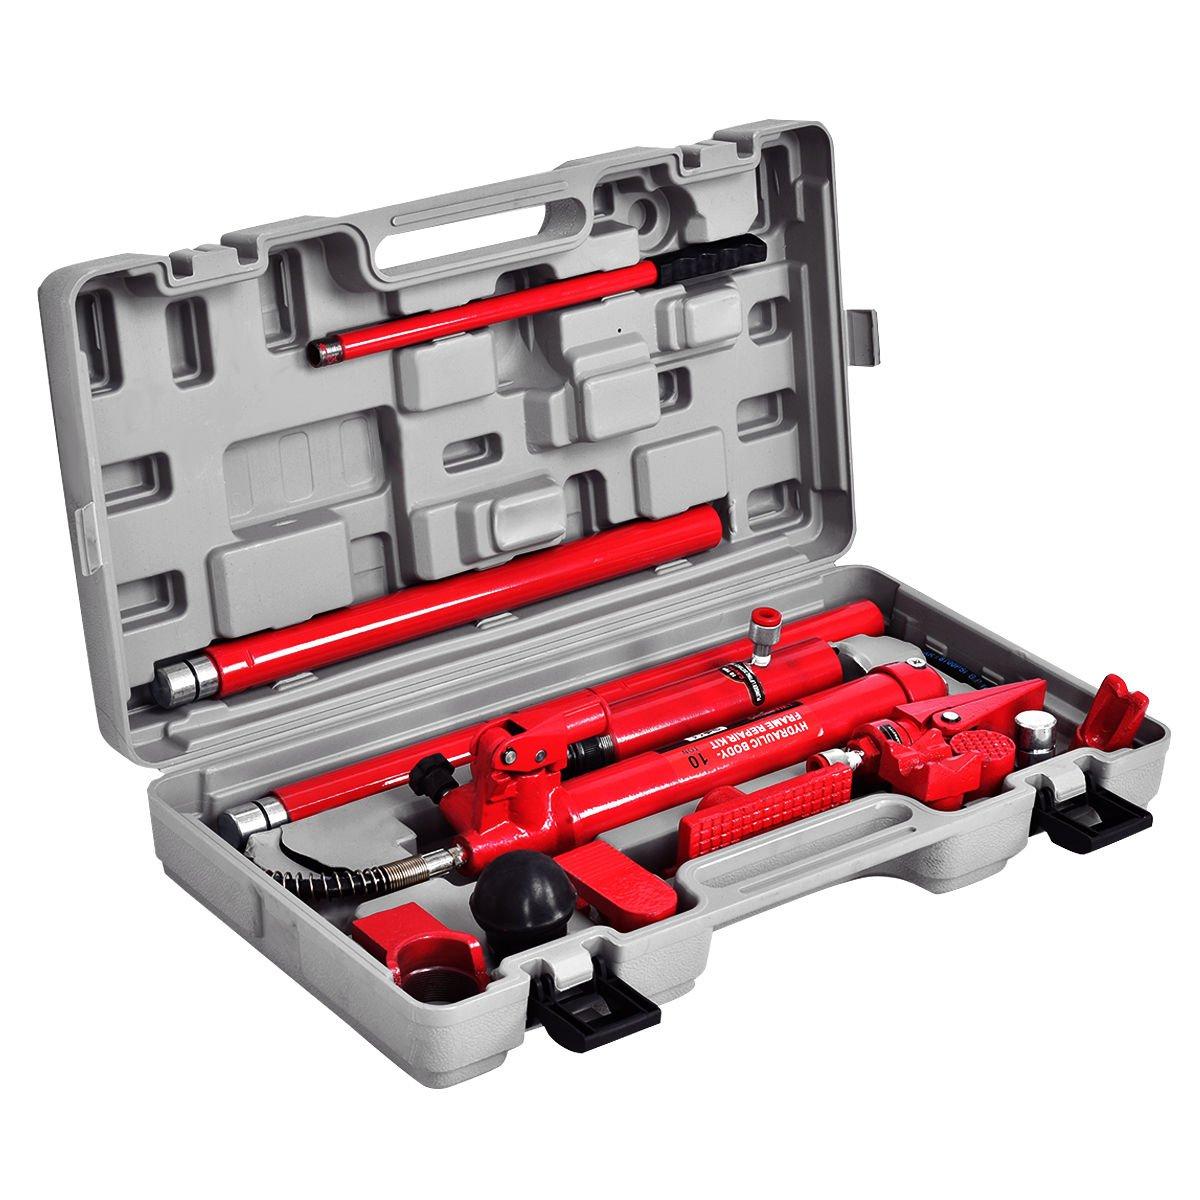 Amazon.com: 10 Ton Porta Power Hydraulic Jack Body Frame Repair Kit Auto  Shop Tool Heavy Set: Automotive